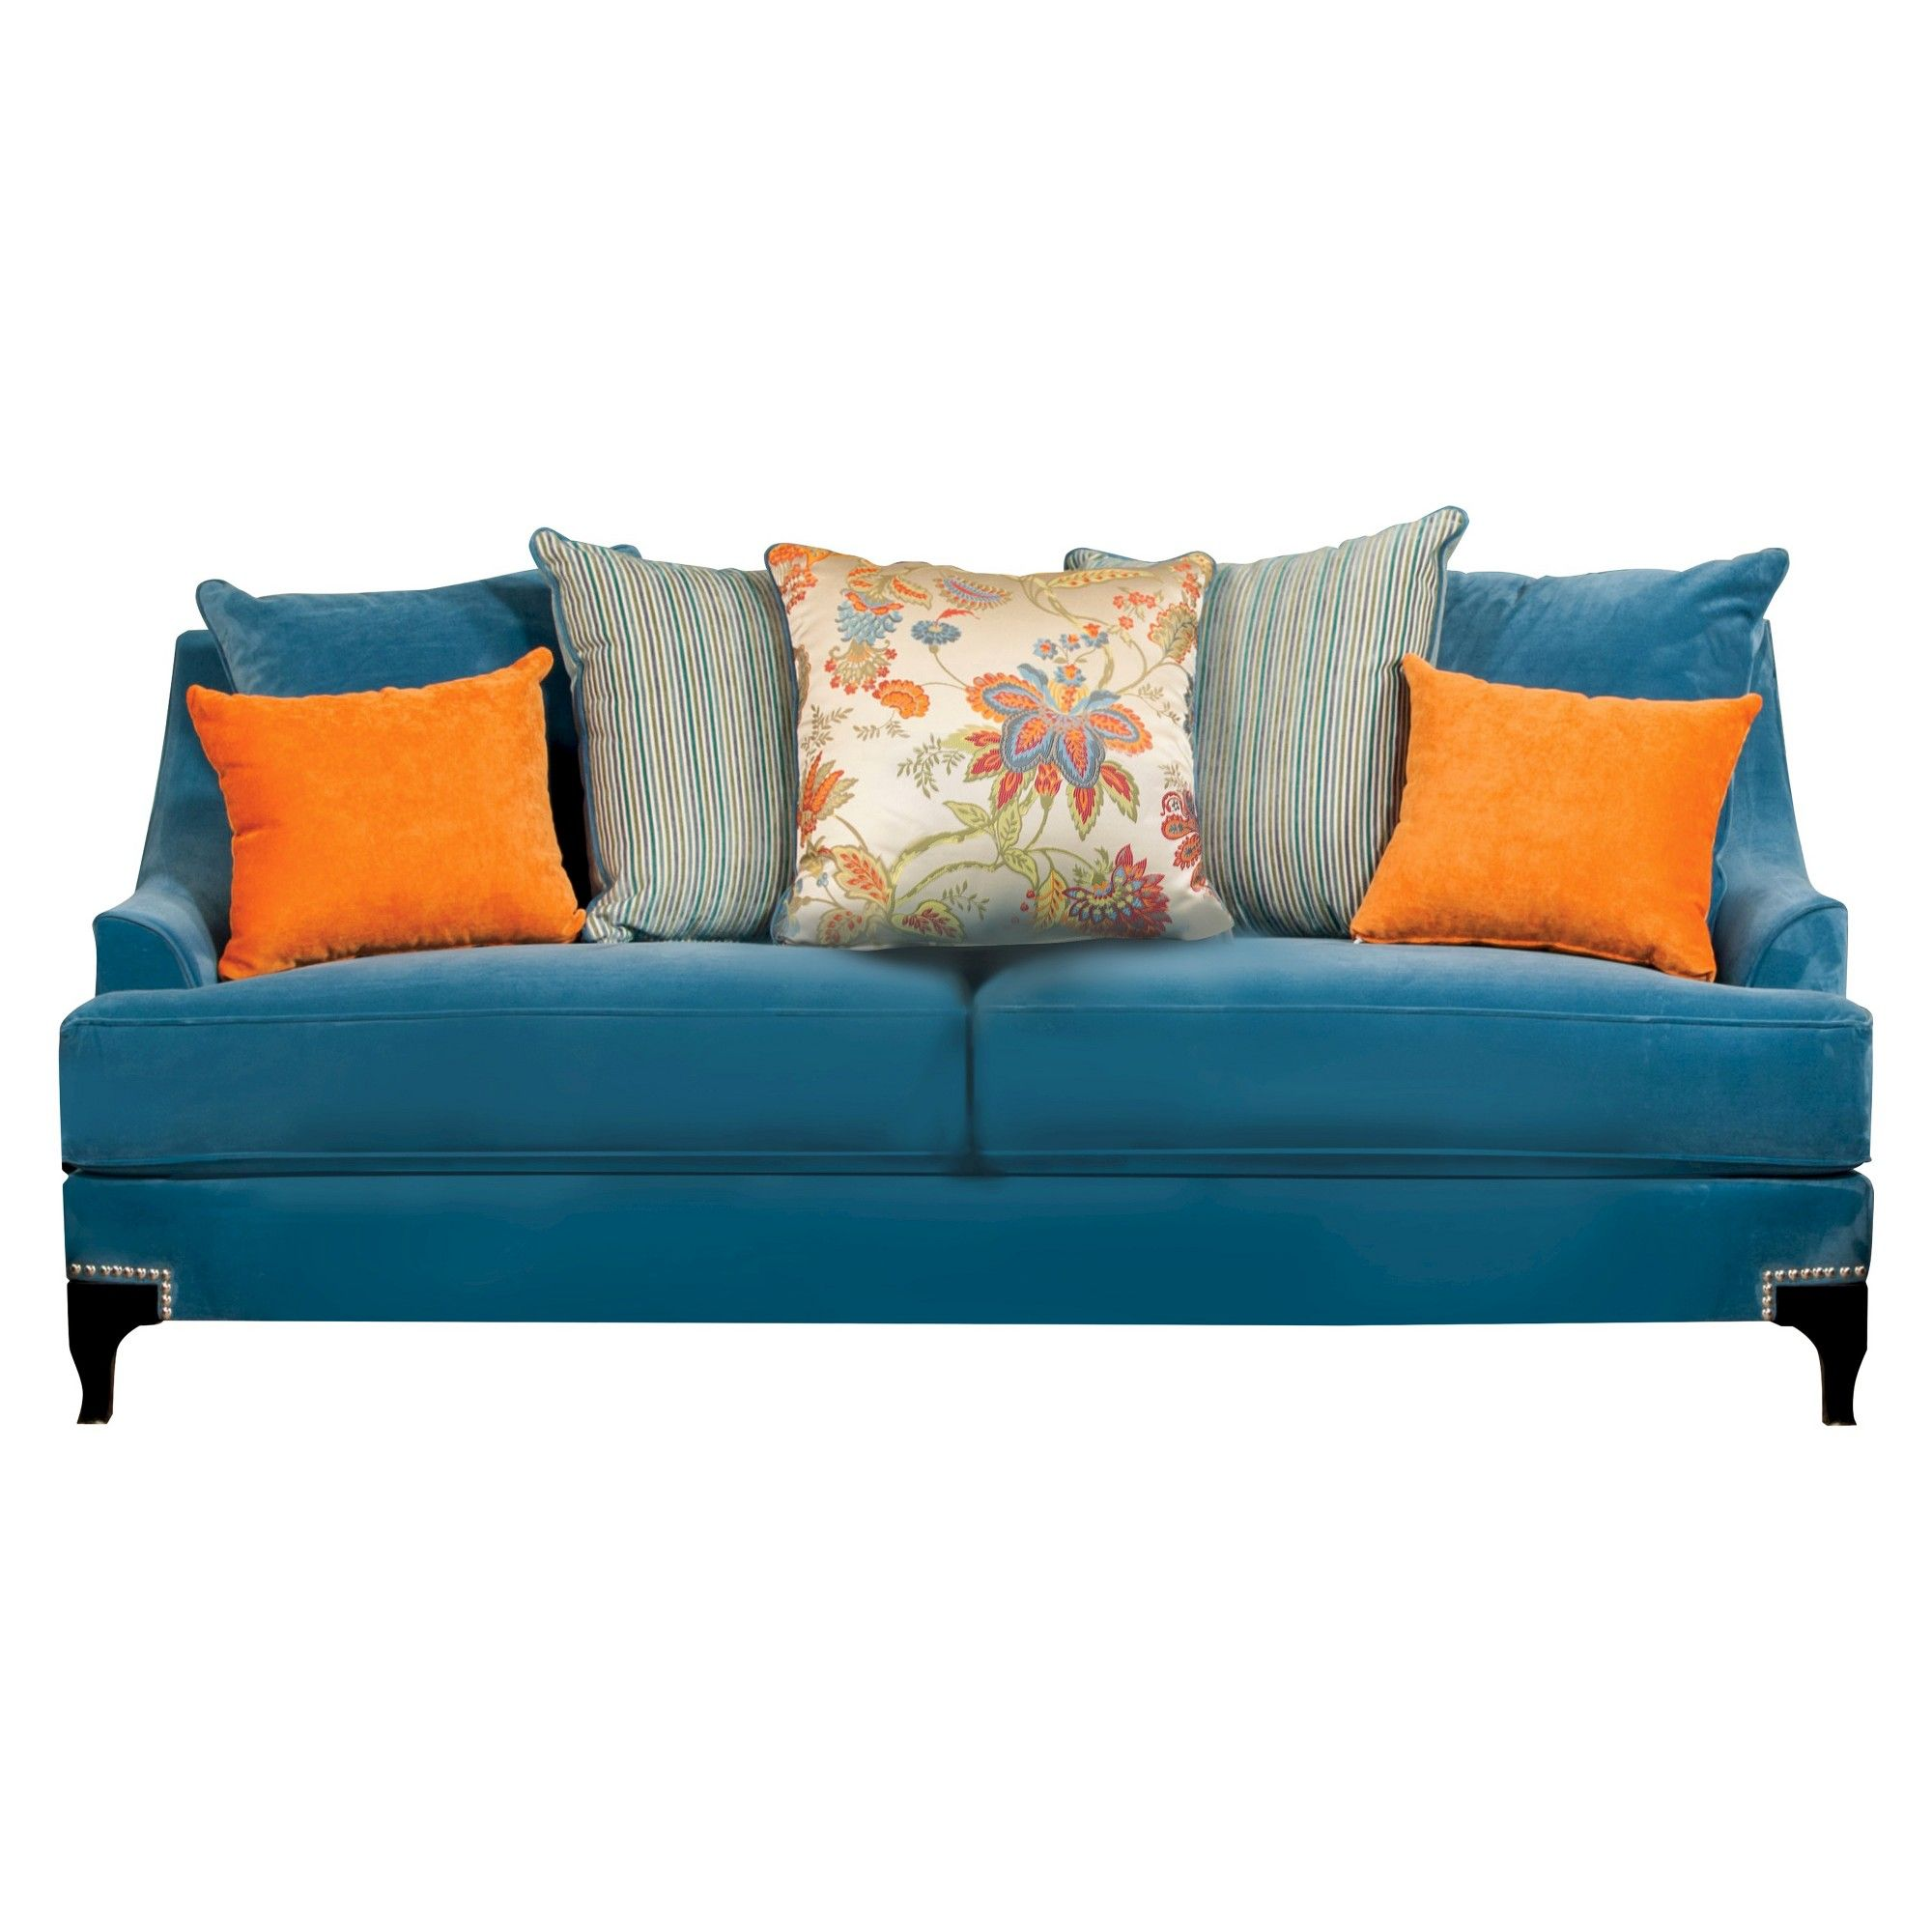 Zoren Retro Upholstered Sofa Peacock Blue Furniture Of